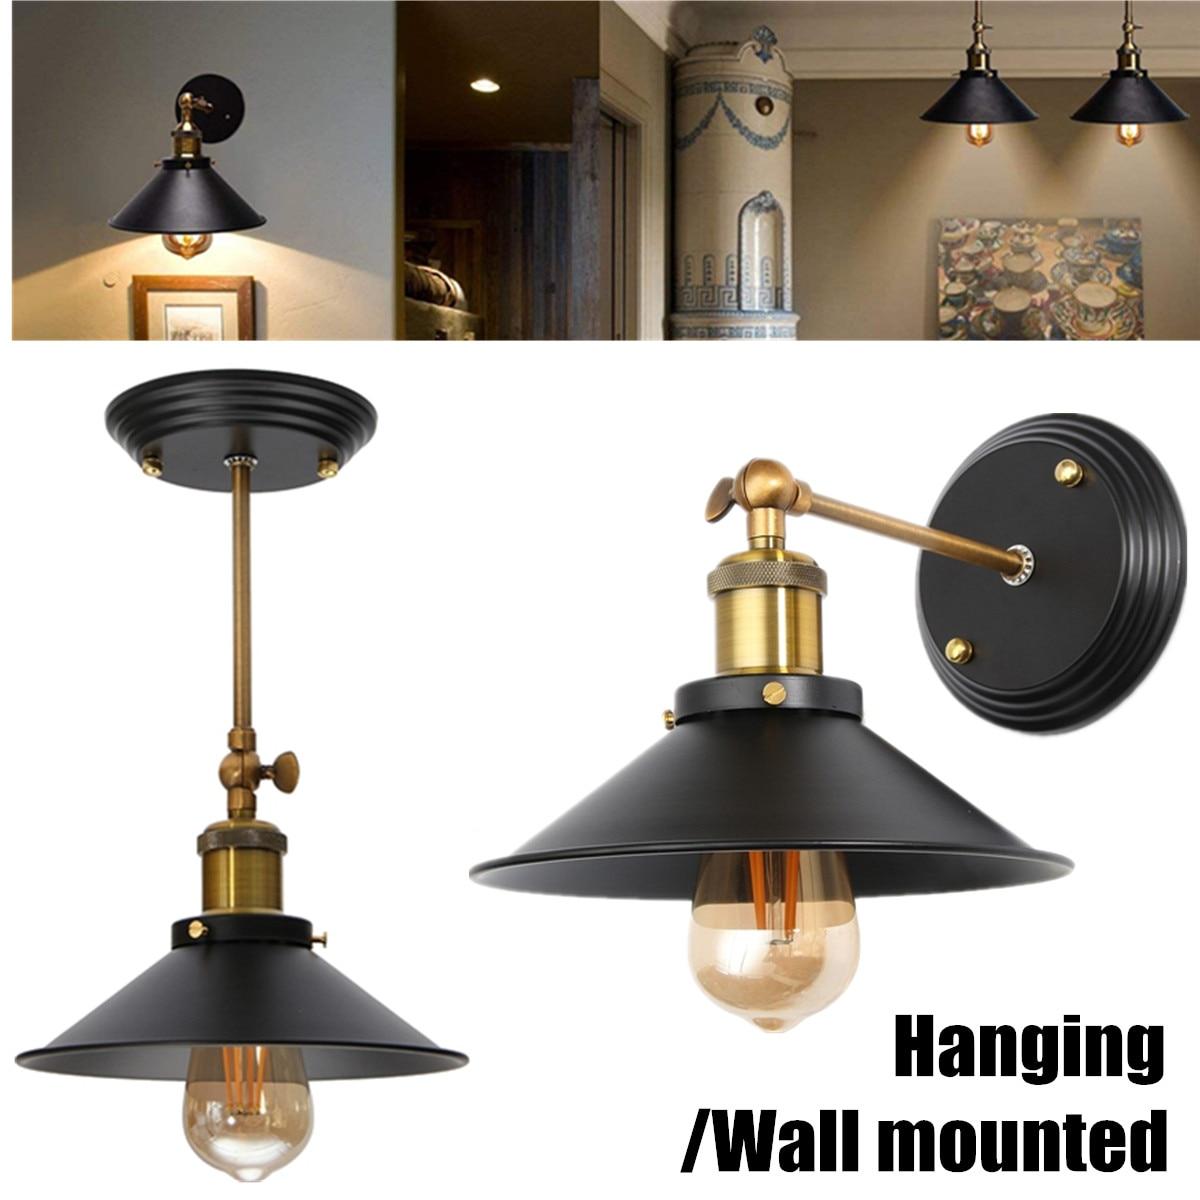 Retro Industrial Iron Pendant Lights Loft Lamp Wall Sconce Light Vintage Hang Pendant Ceiling Lamp for Restaurant Kitchen Home